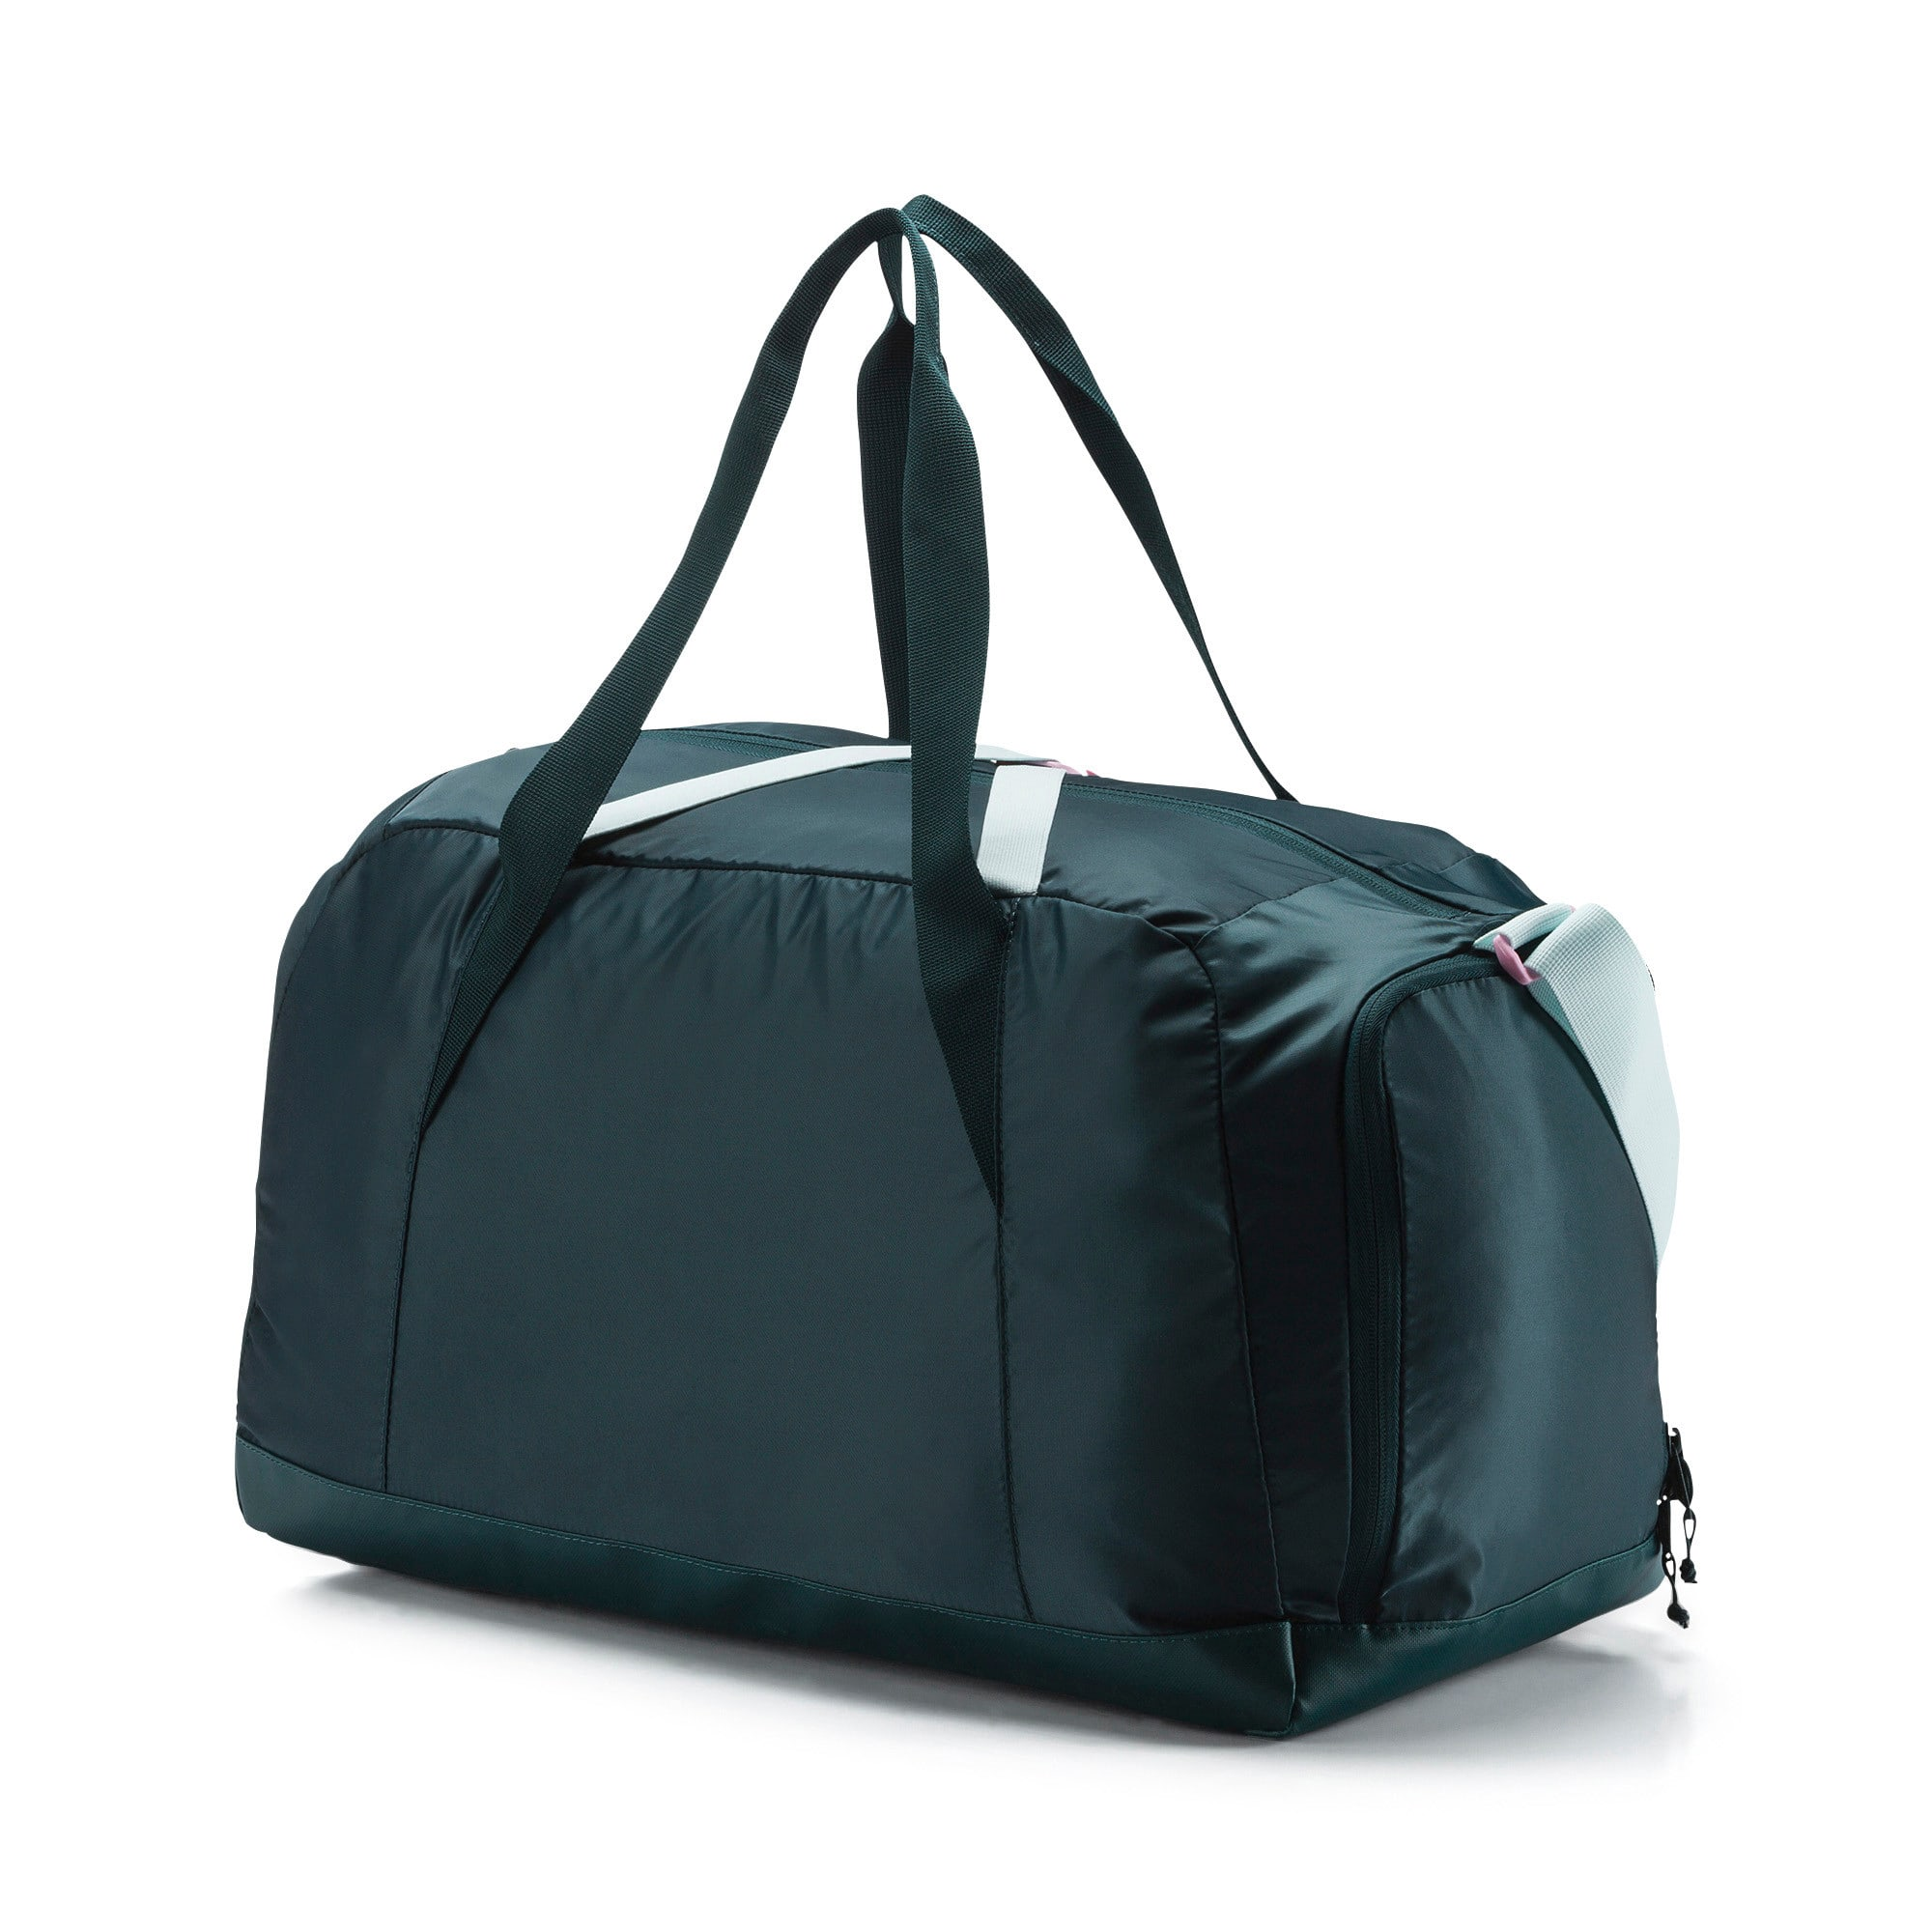 Thumbnail 3 of Active Women's Training Duffle Bag, Ponderosa Pine, medium